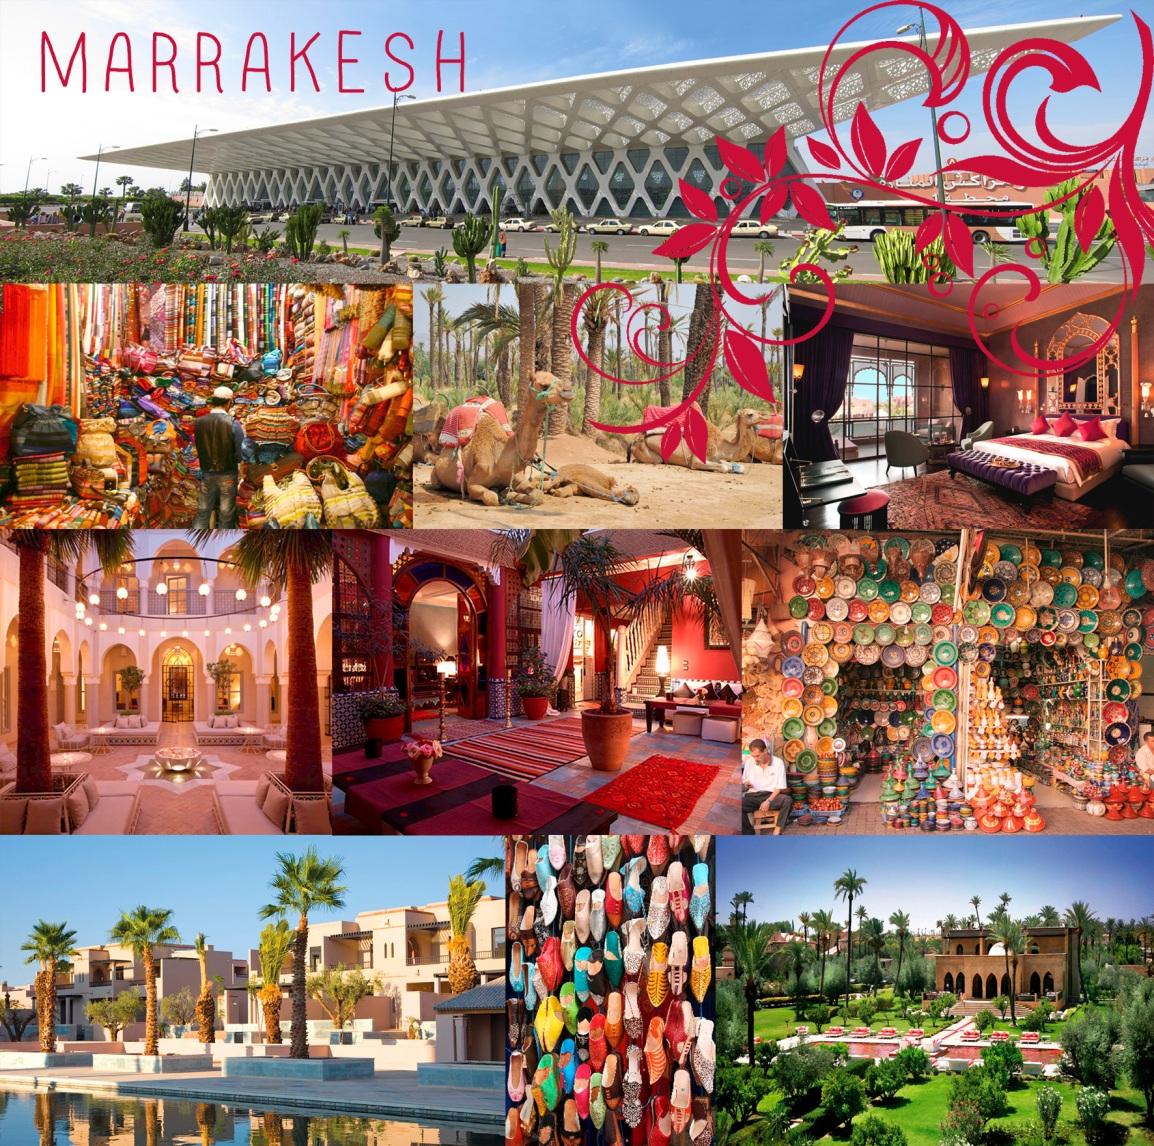 marrakeshDEKor#1